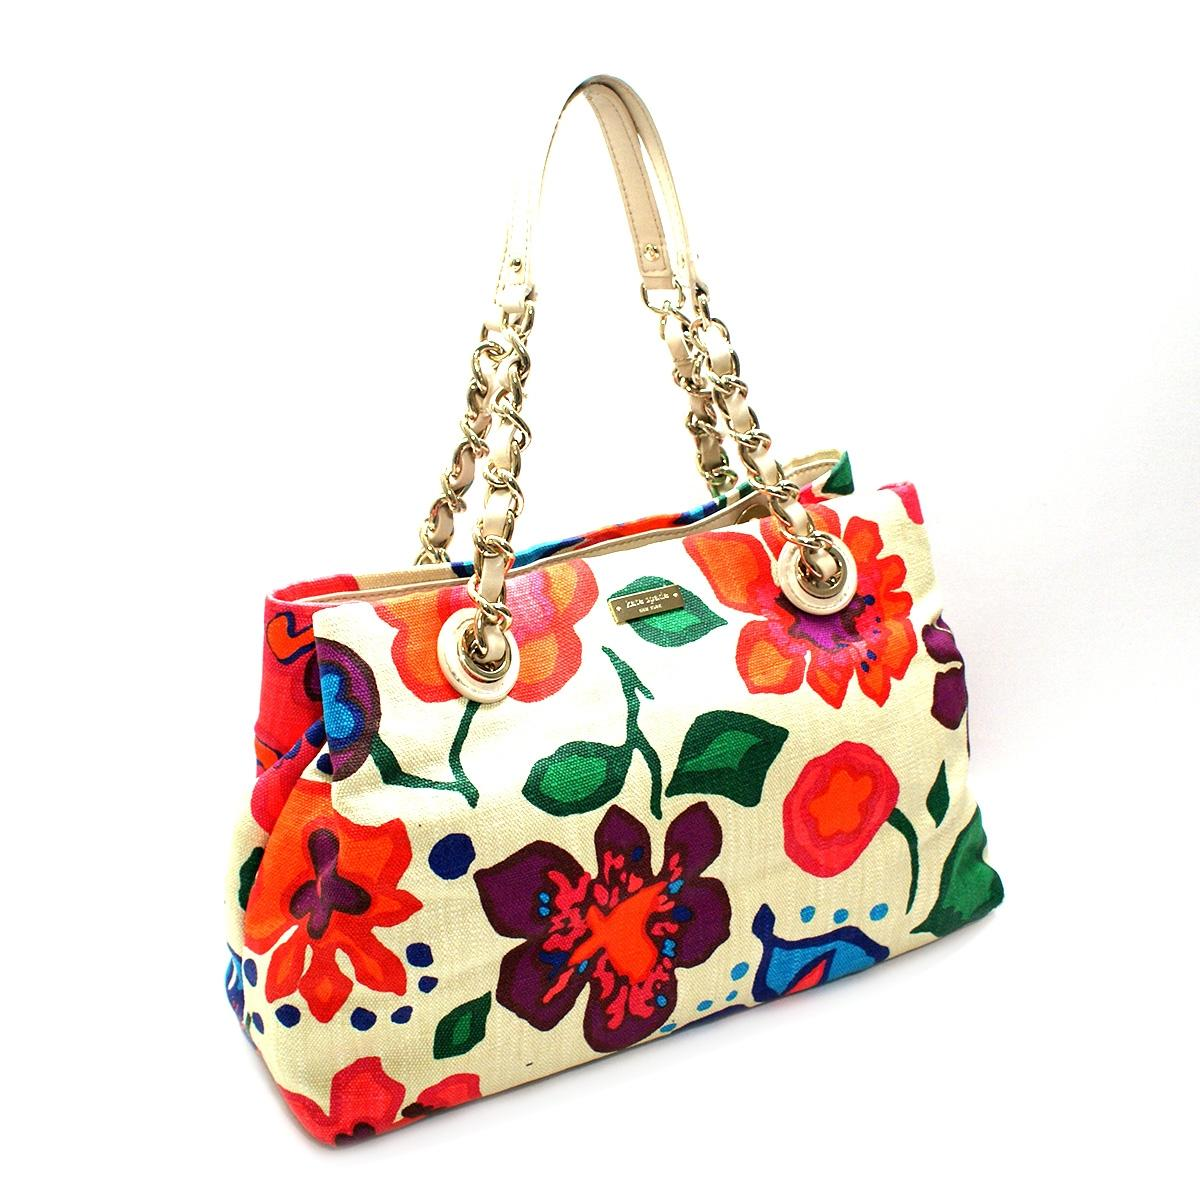 Kate Spade Maryanne Fiesta Floral Print Tote/ Shoulder Bag Clotted Cream #PXRU4244 | Kate Spade ...